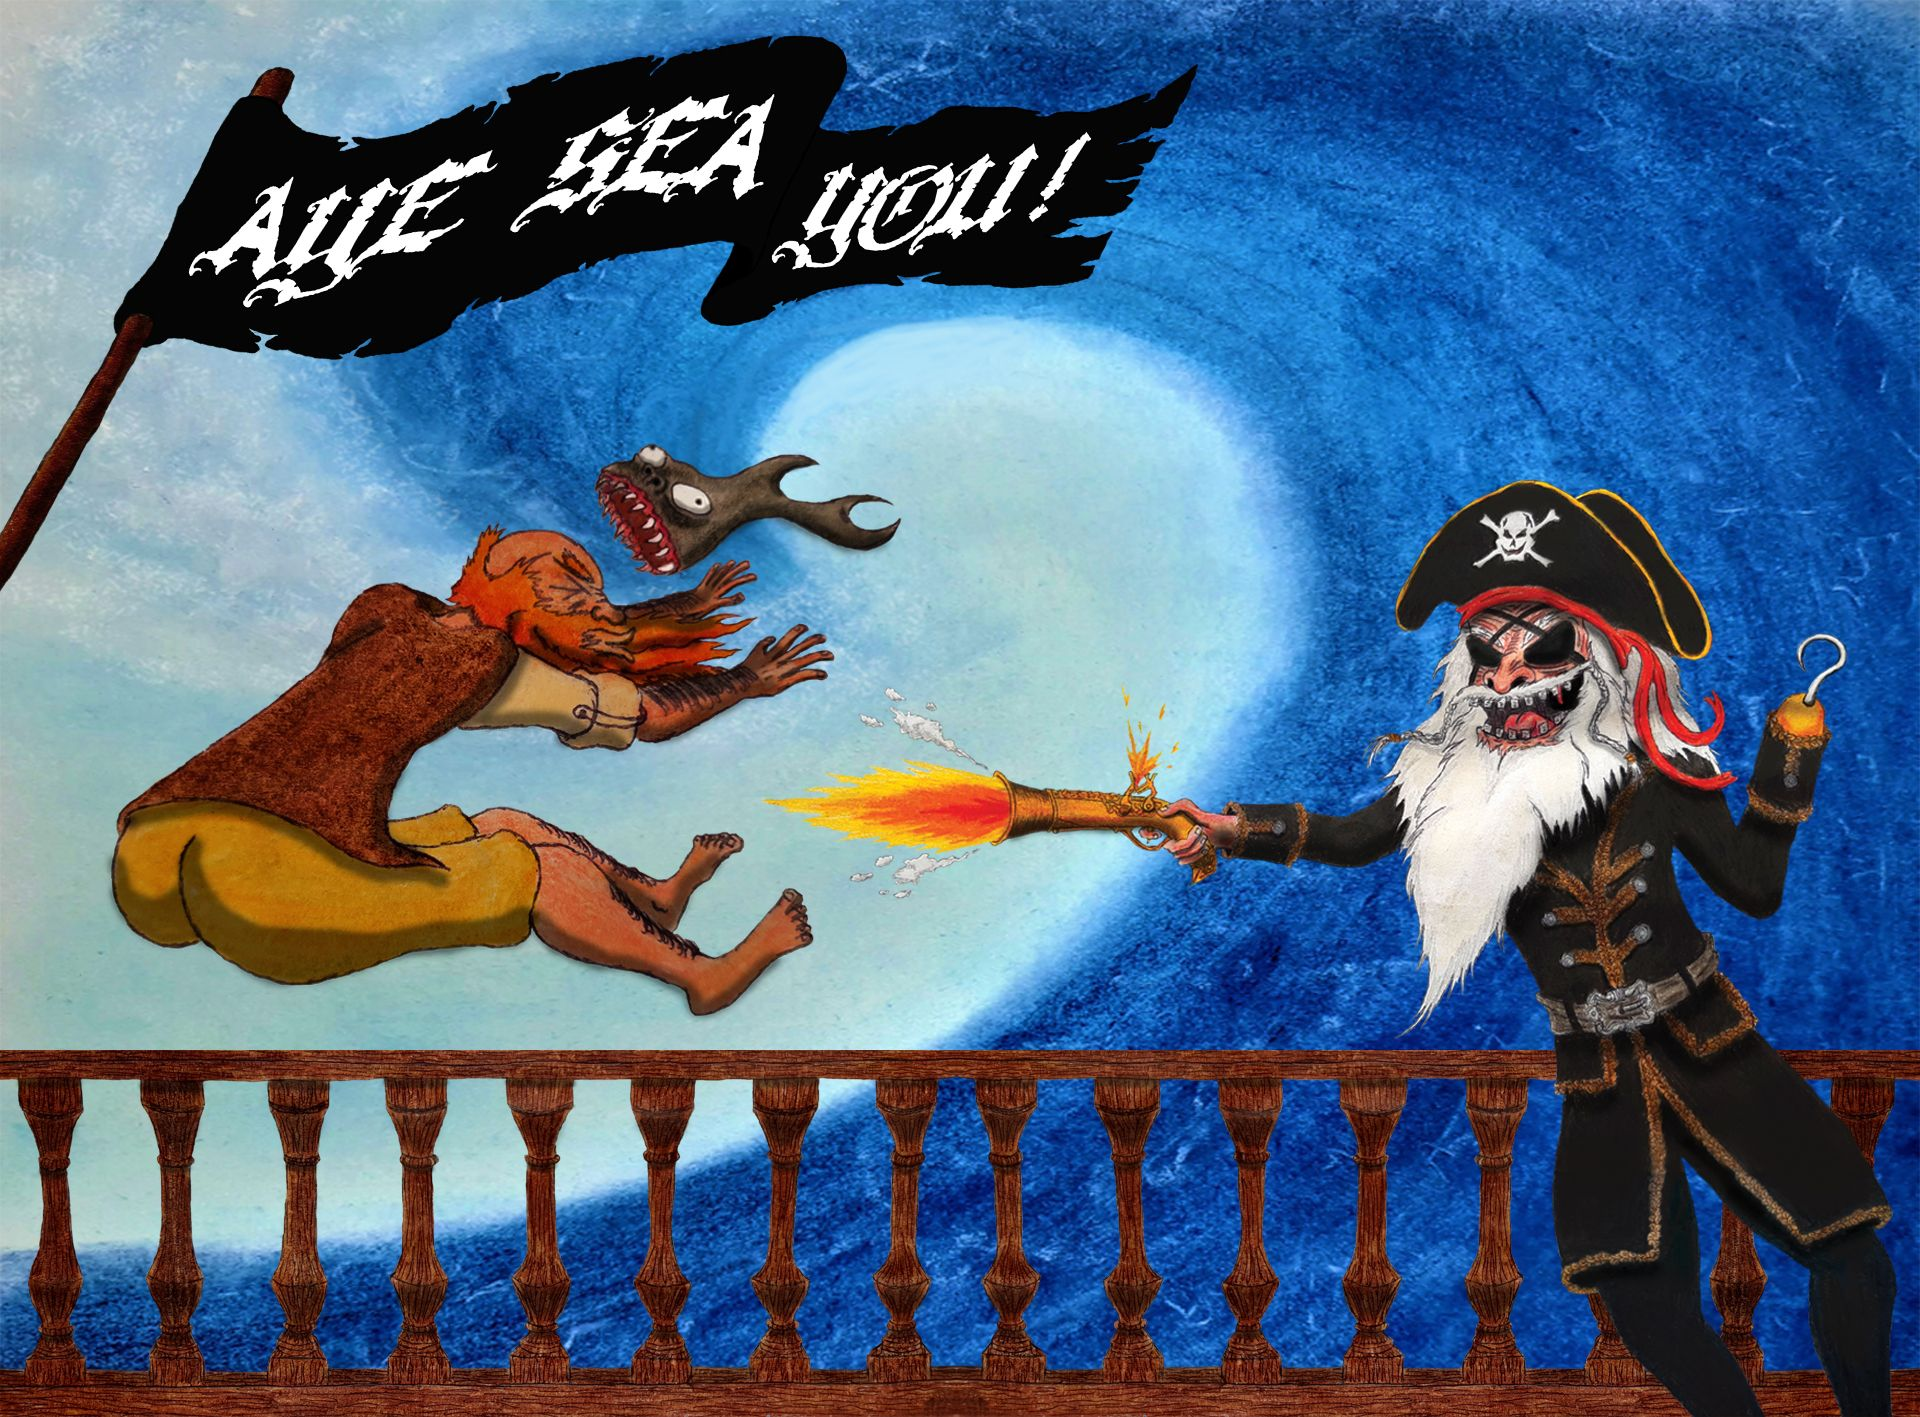 Aye Sea You!